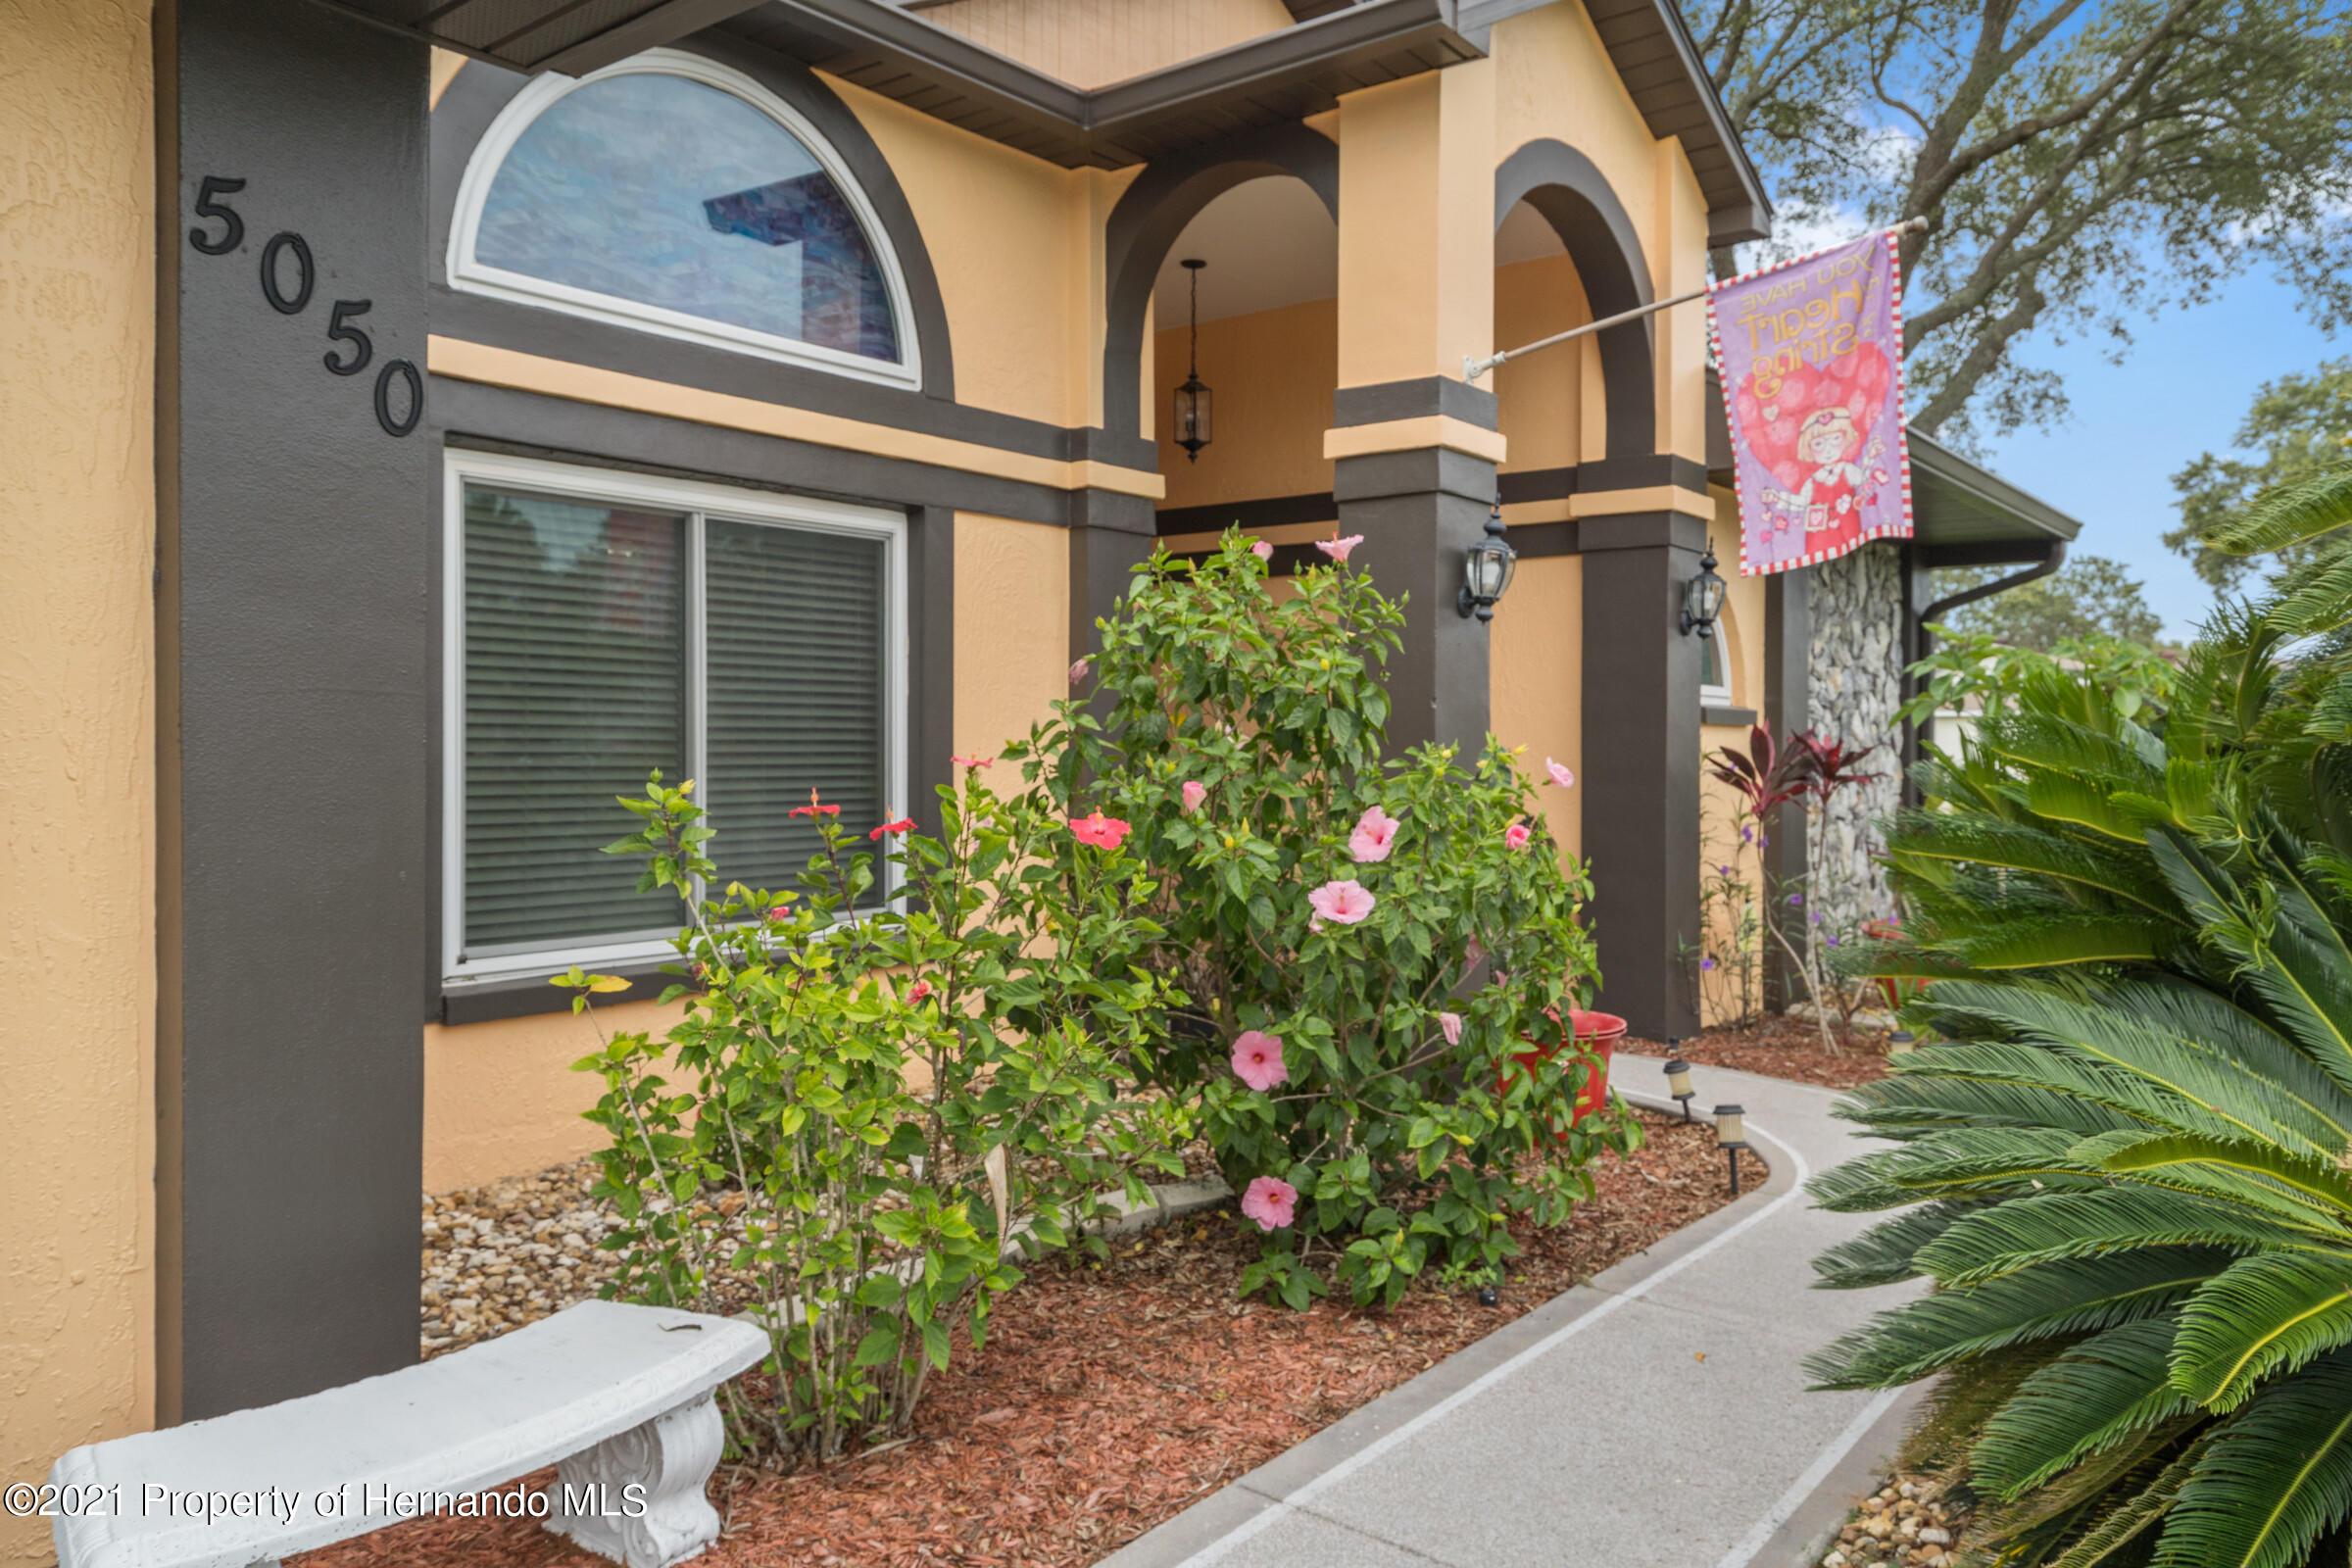 Image 5 For 5050 Gaston Street